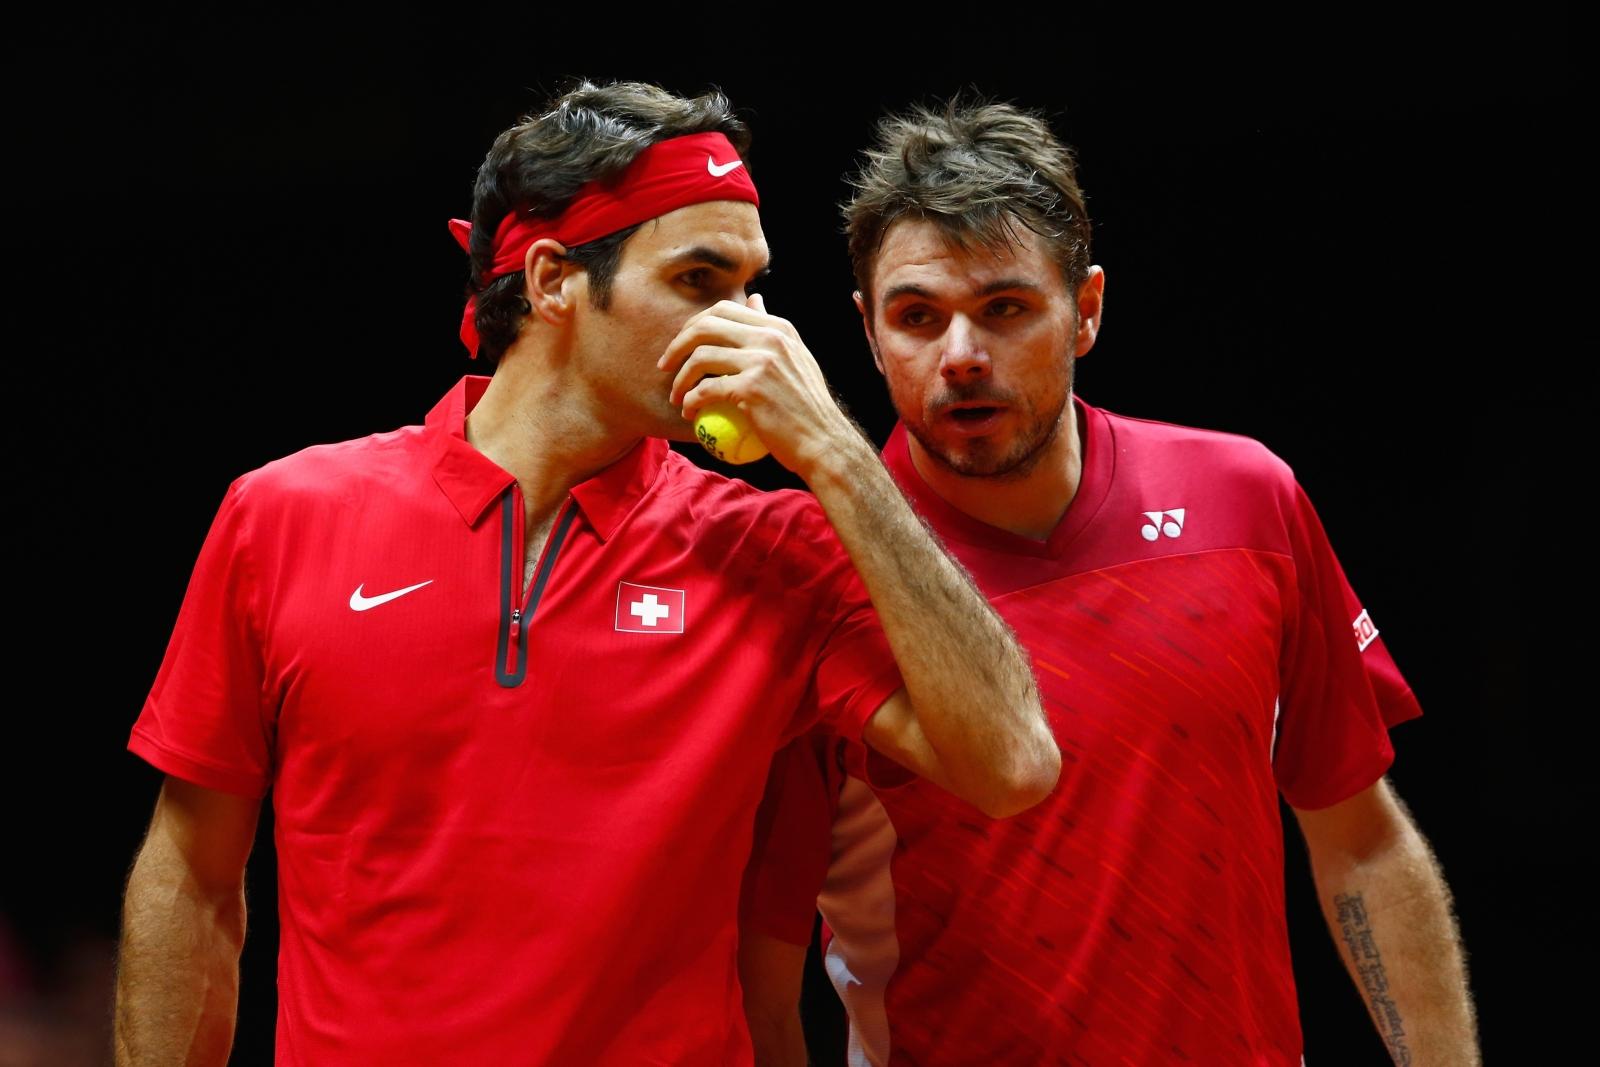 Federer and Wawrinka